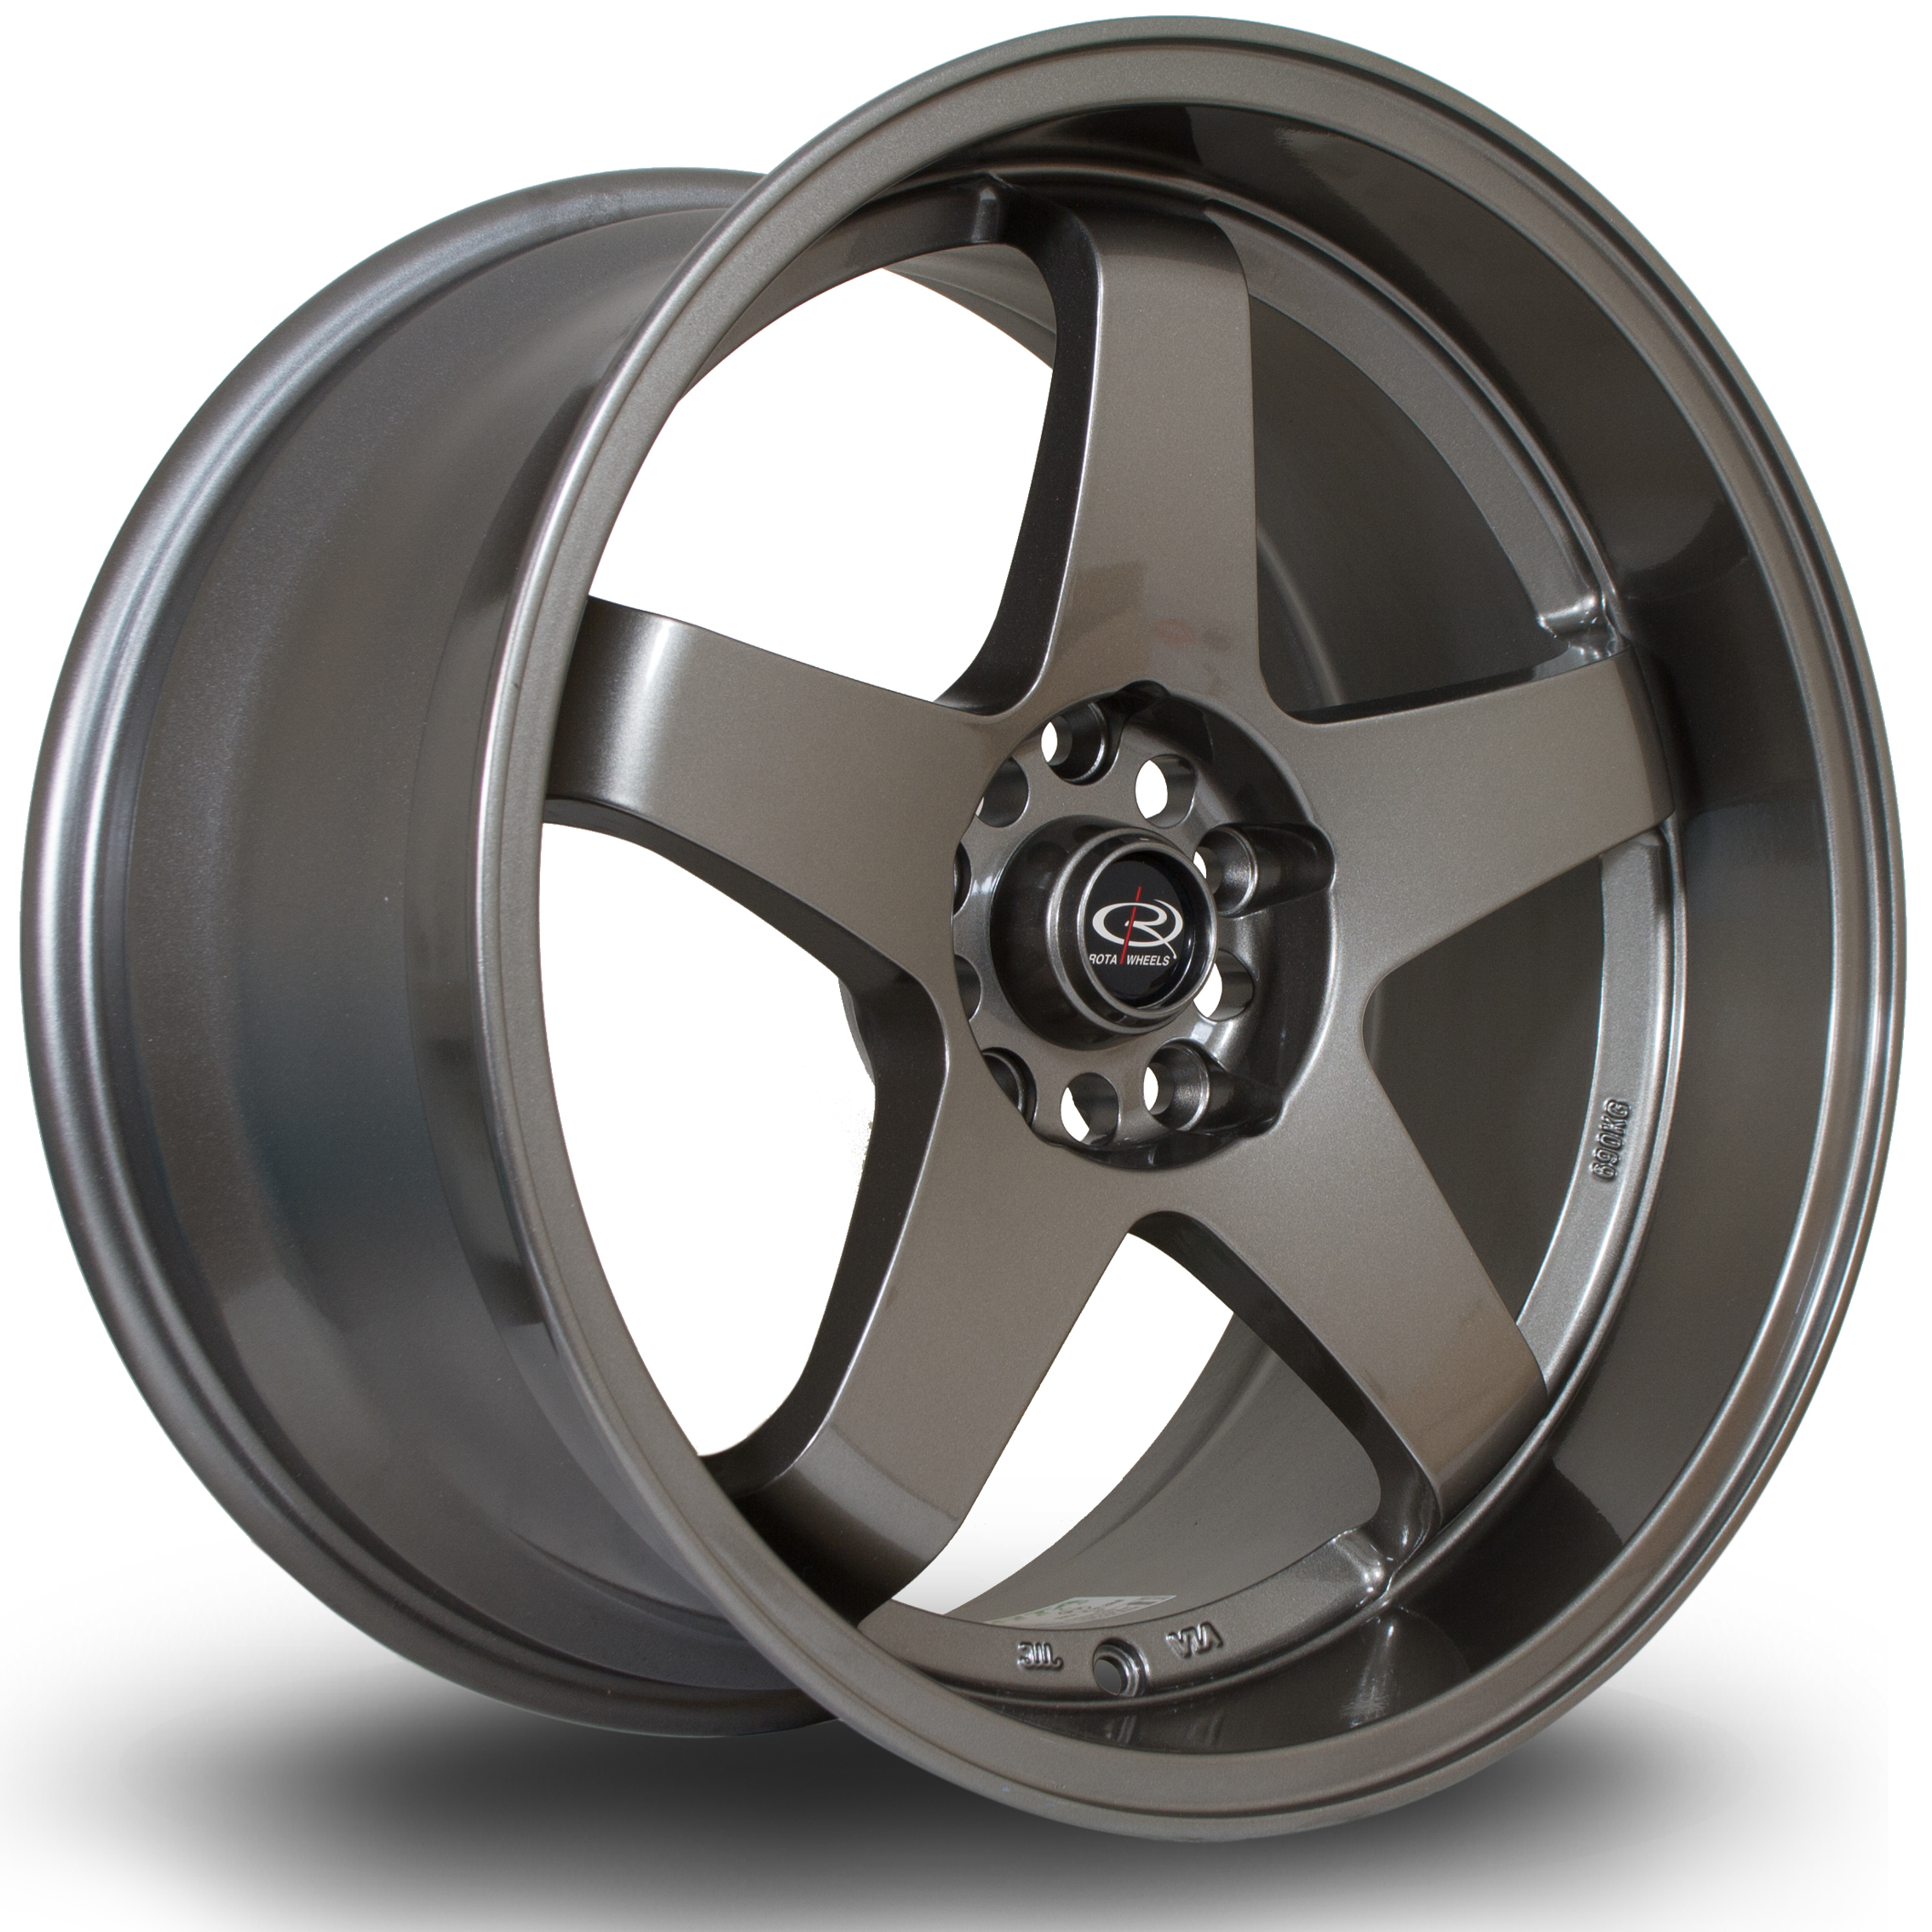 Rota GTR wheels